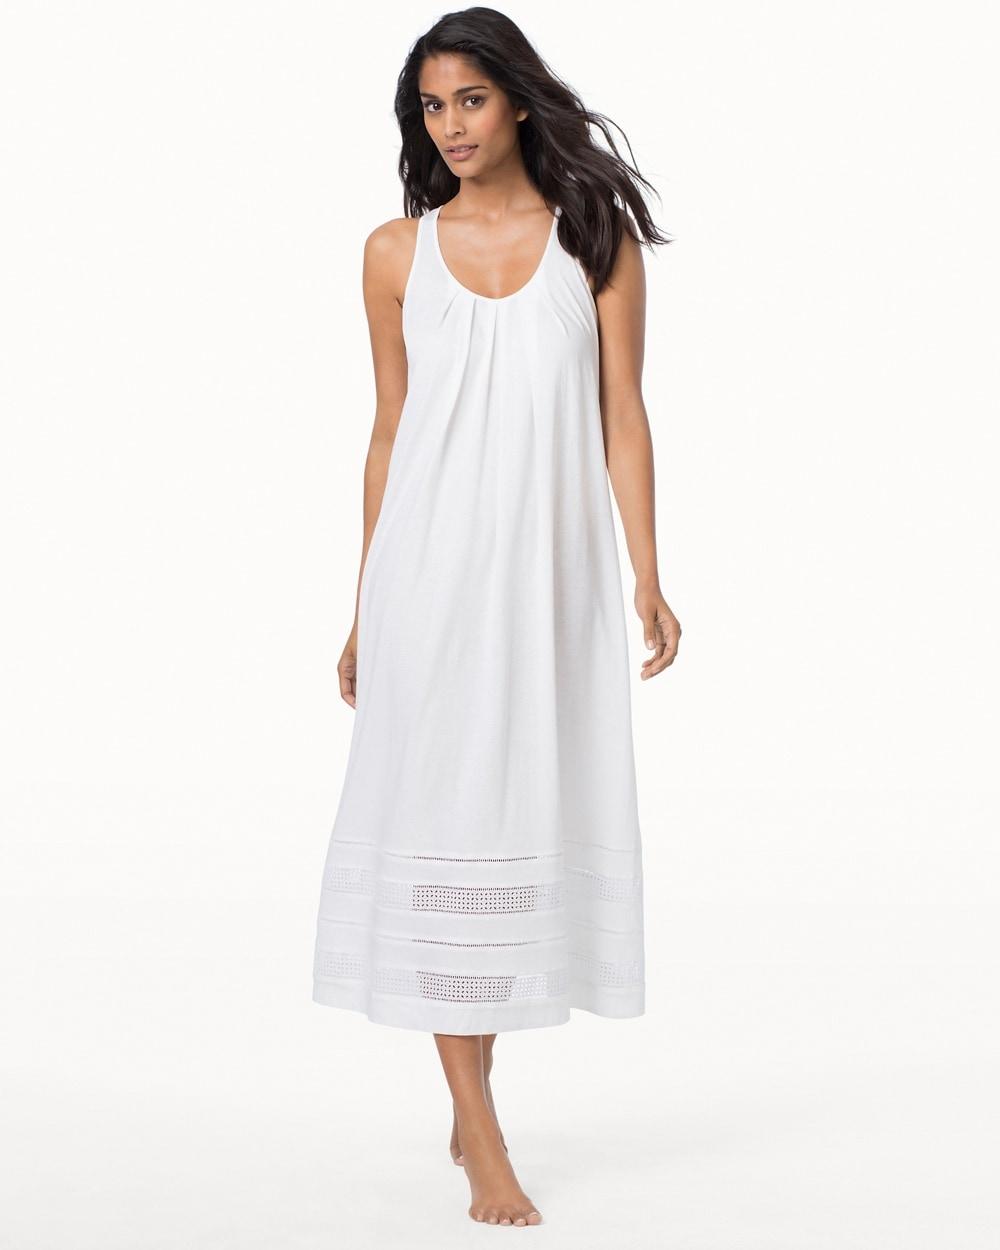 Luxe Spa Pima Cotton Nightgown - Soma